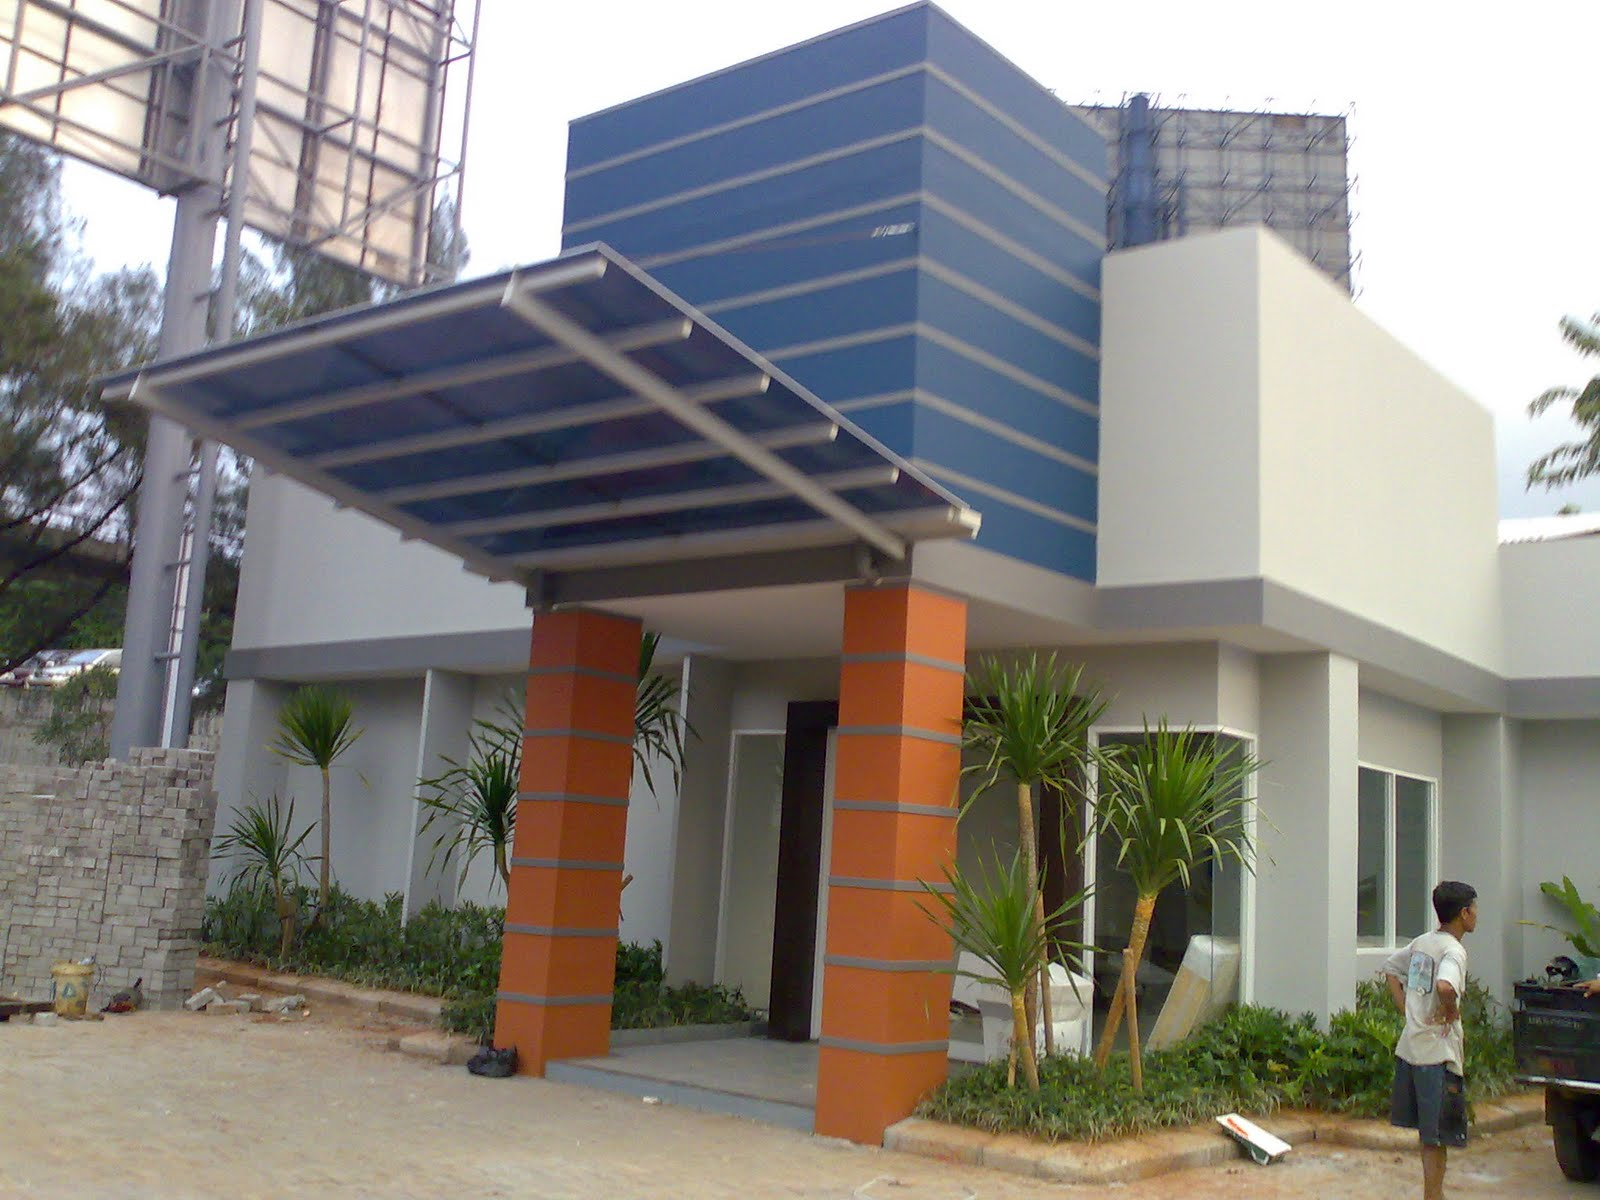 Plafon Dari Baja Ringan Rangka Atap , Design Arsitecture & Interior ...